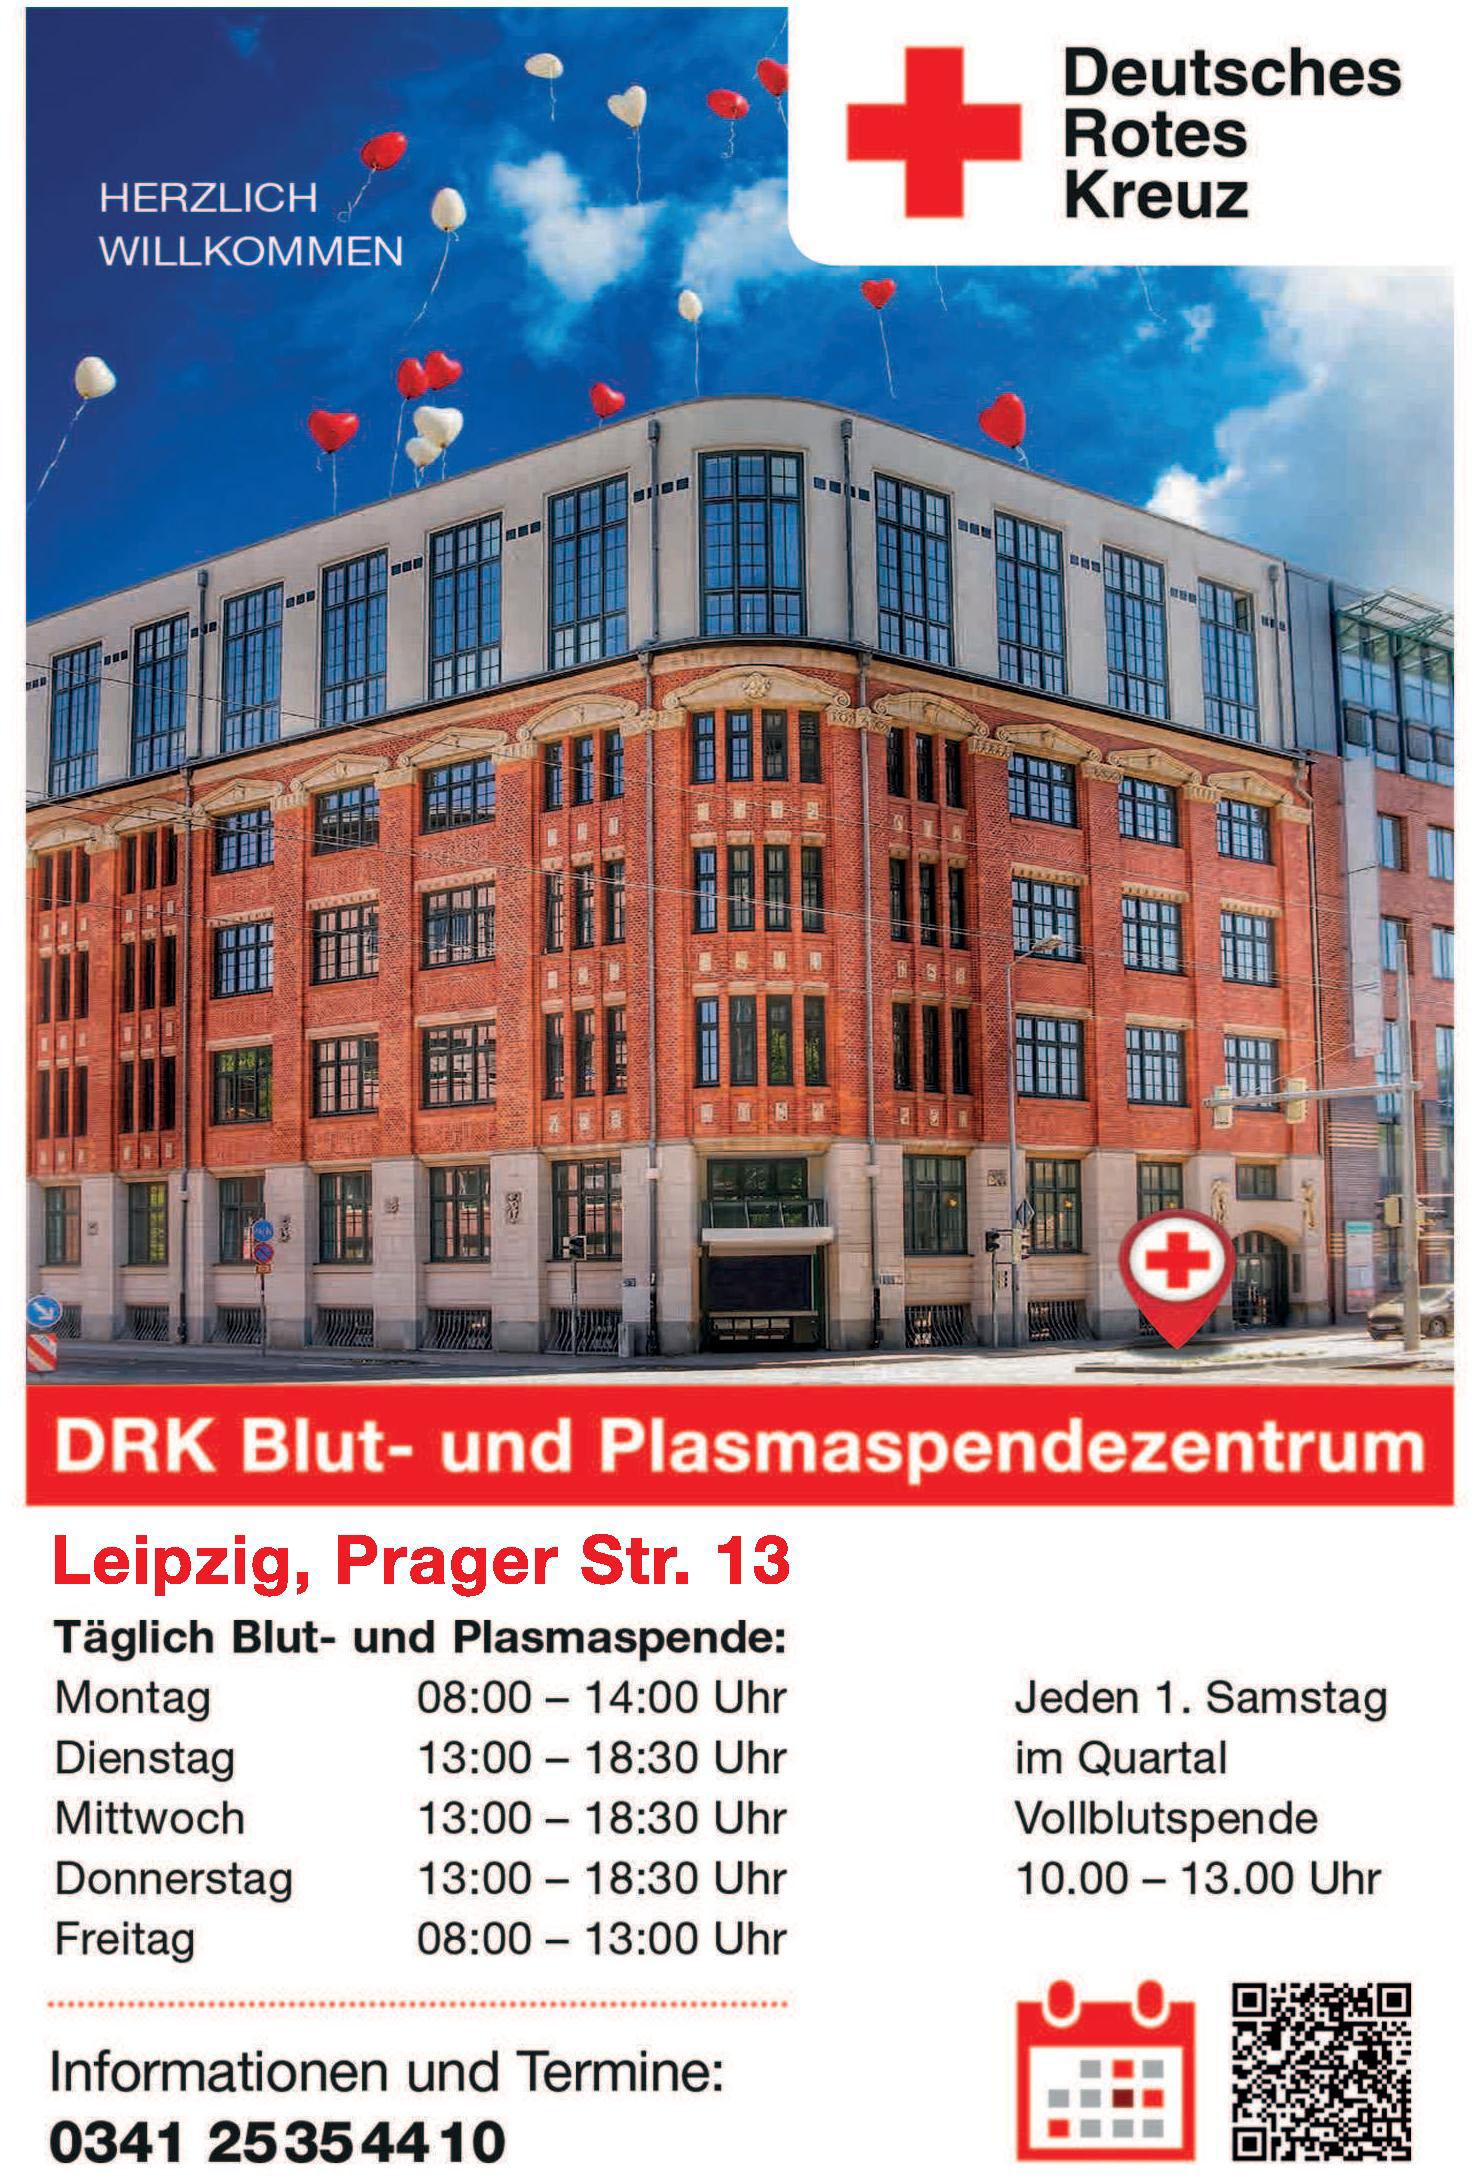 DRK Blut-und Plasmaspendezentrum